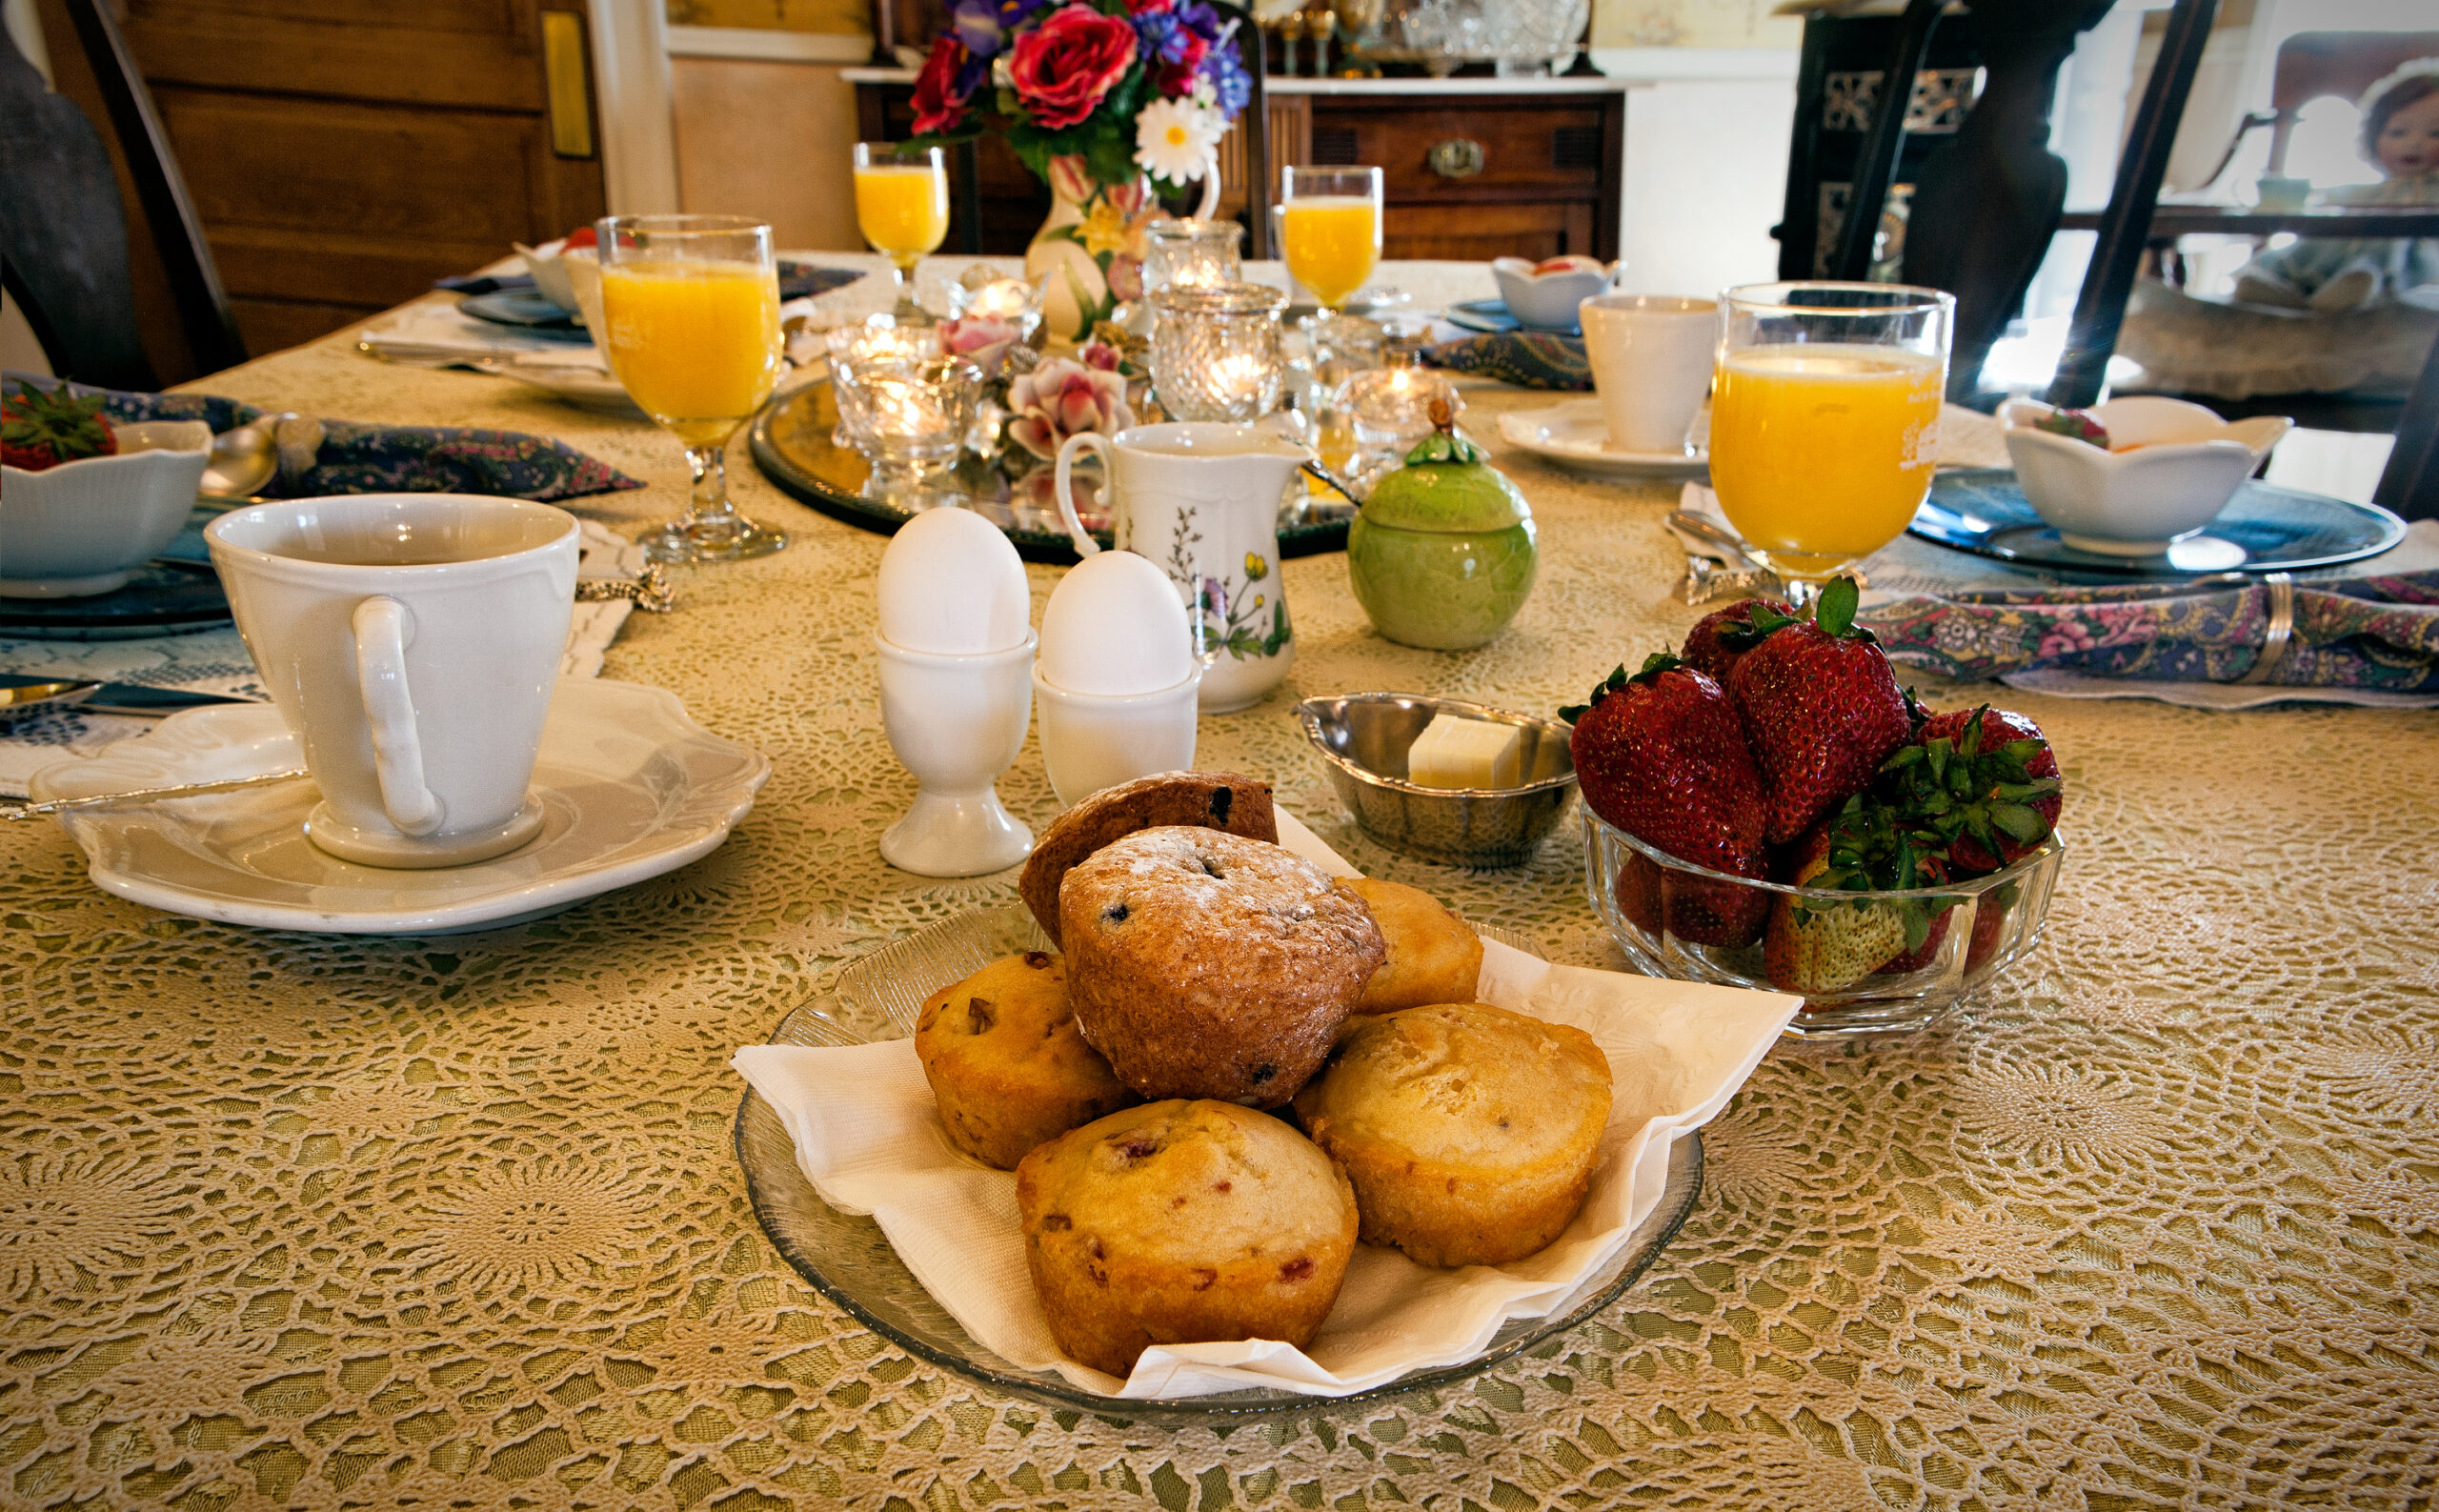 Holden House 1902 Bed & Breakfast Inn - Bed & Breakfast Innkeepers of Colorado Association